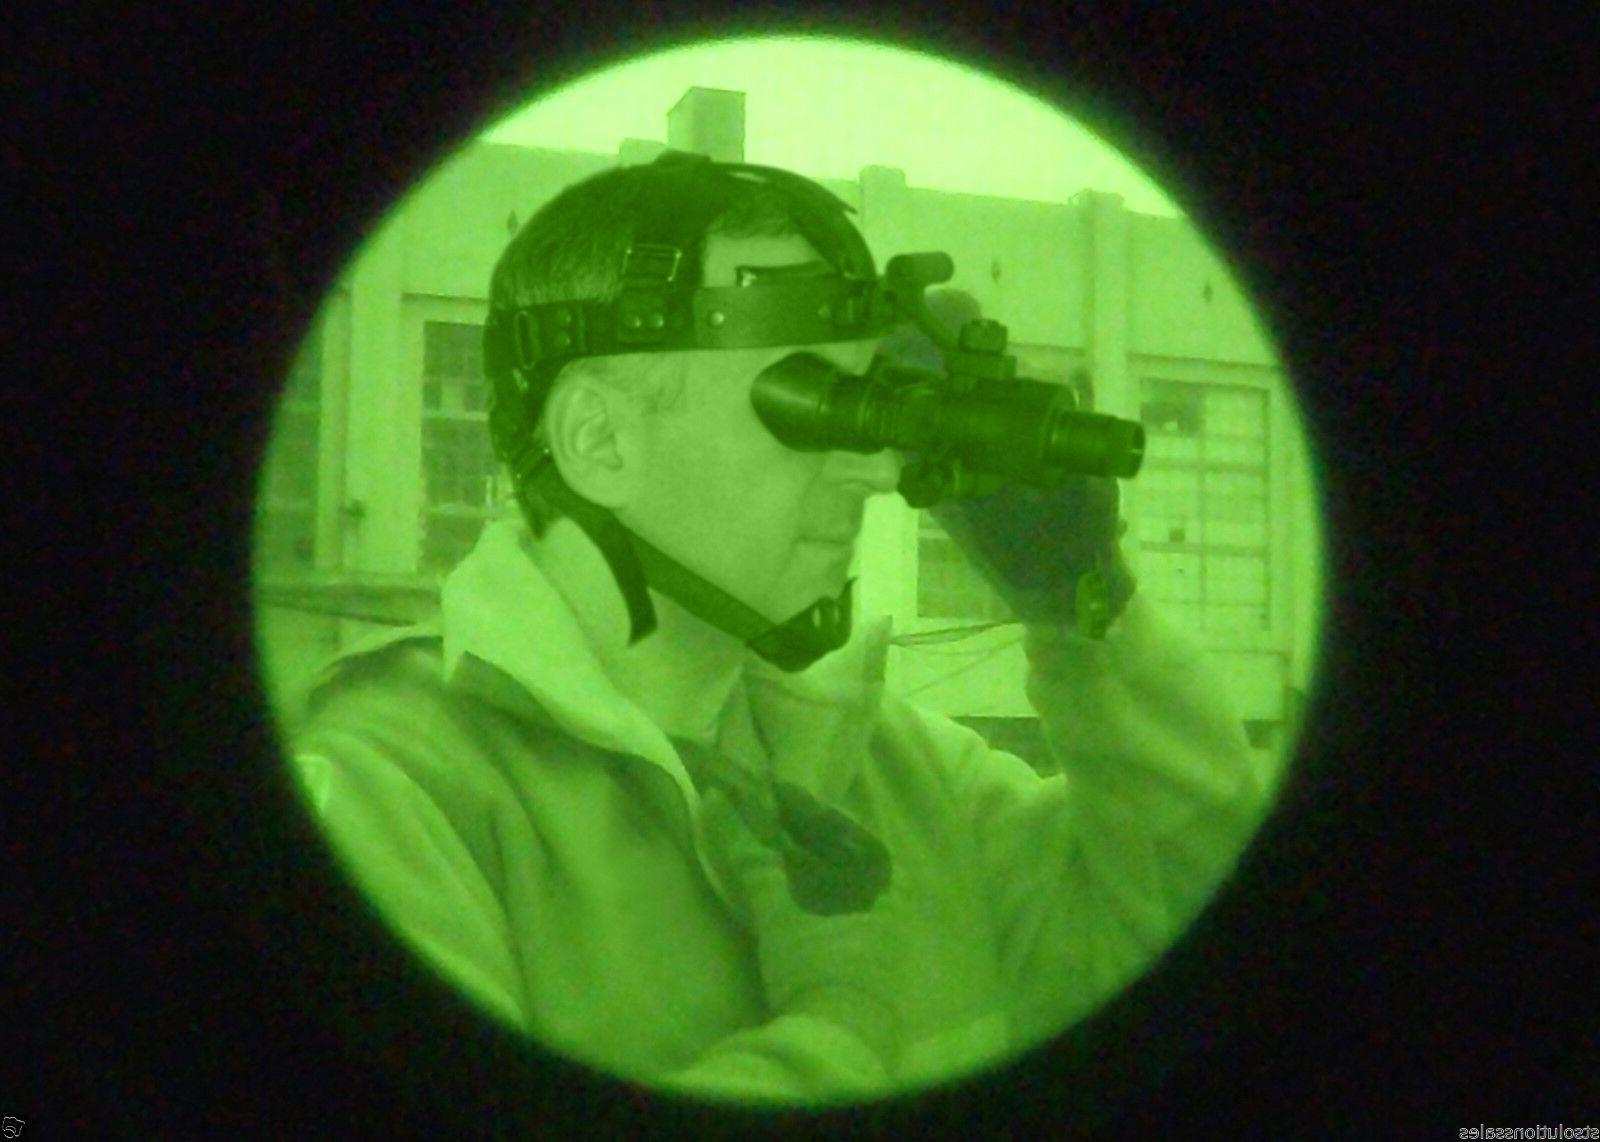 Armasight Nyx-7 Night Vision Gen 2+